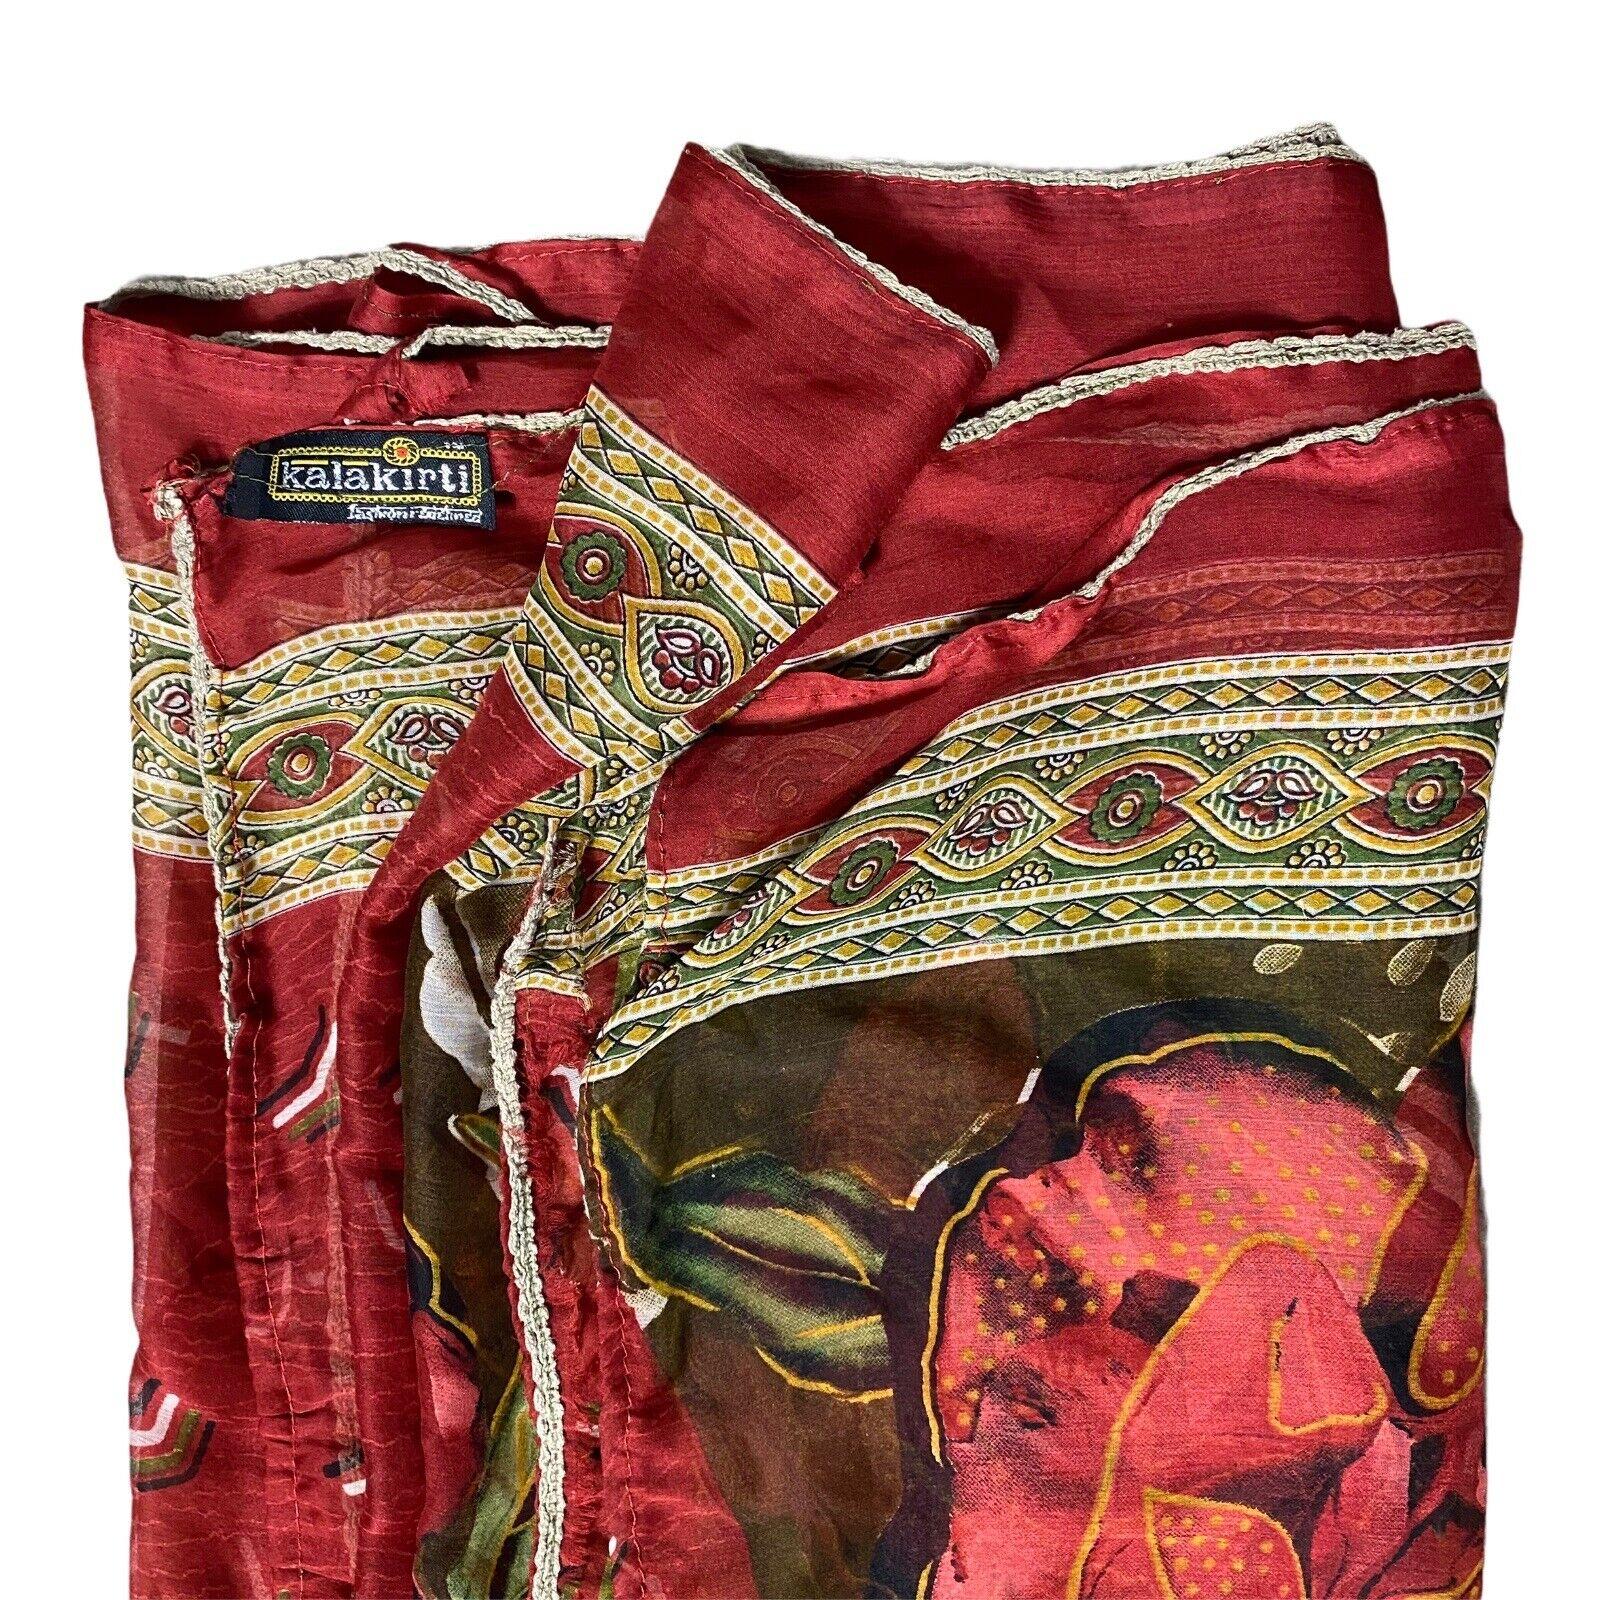 Vintage 80s 90s Overdize Floral Scarf Wrap Skirt … - image 7